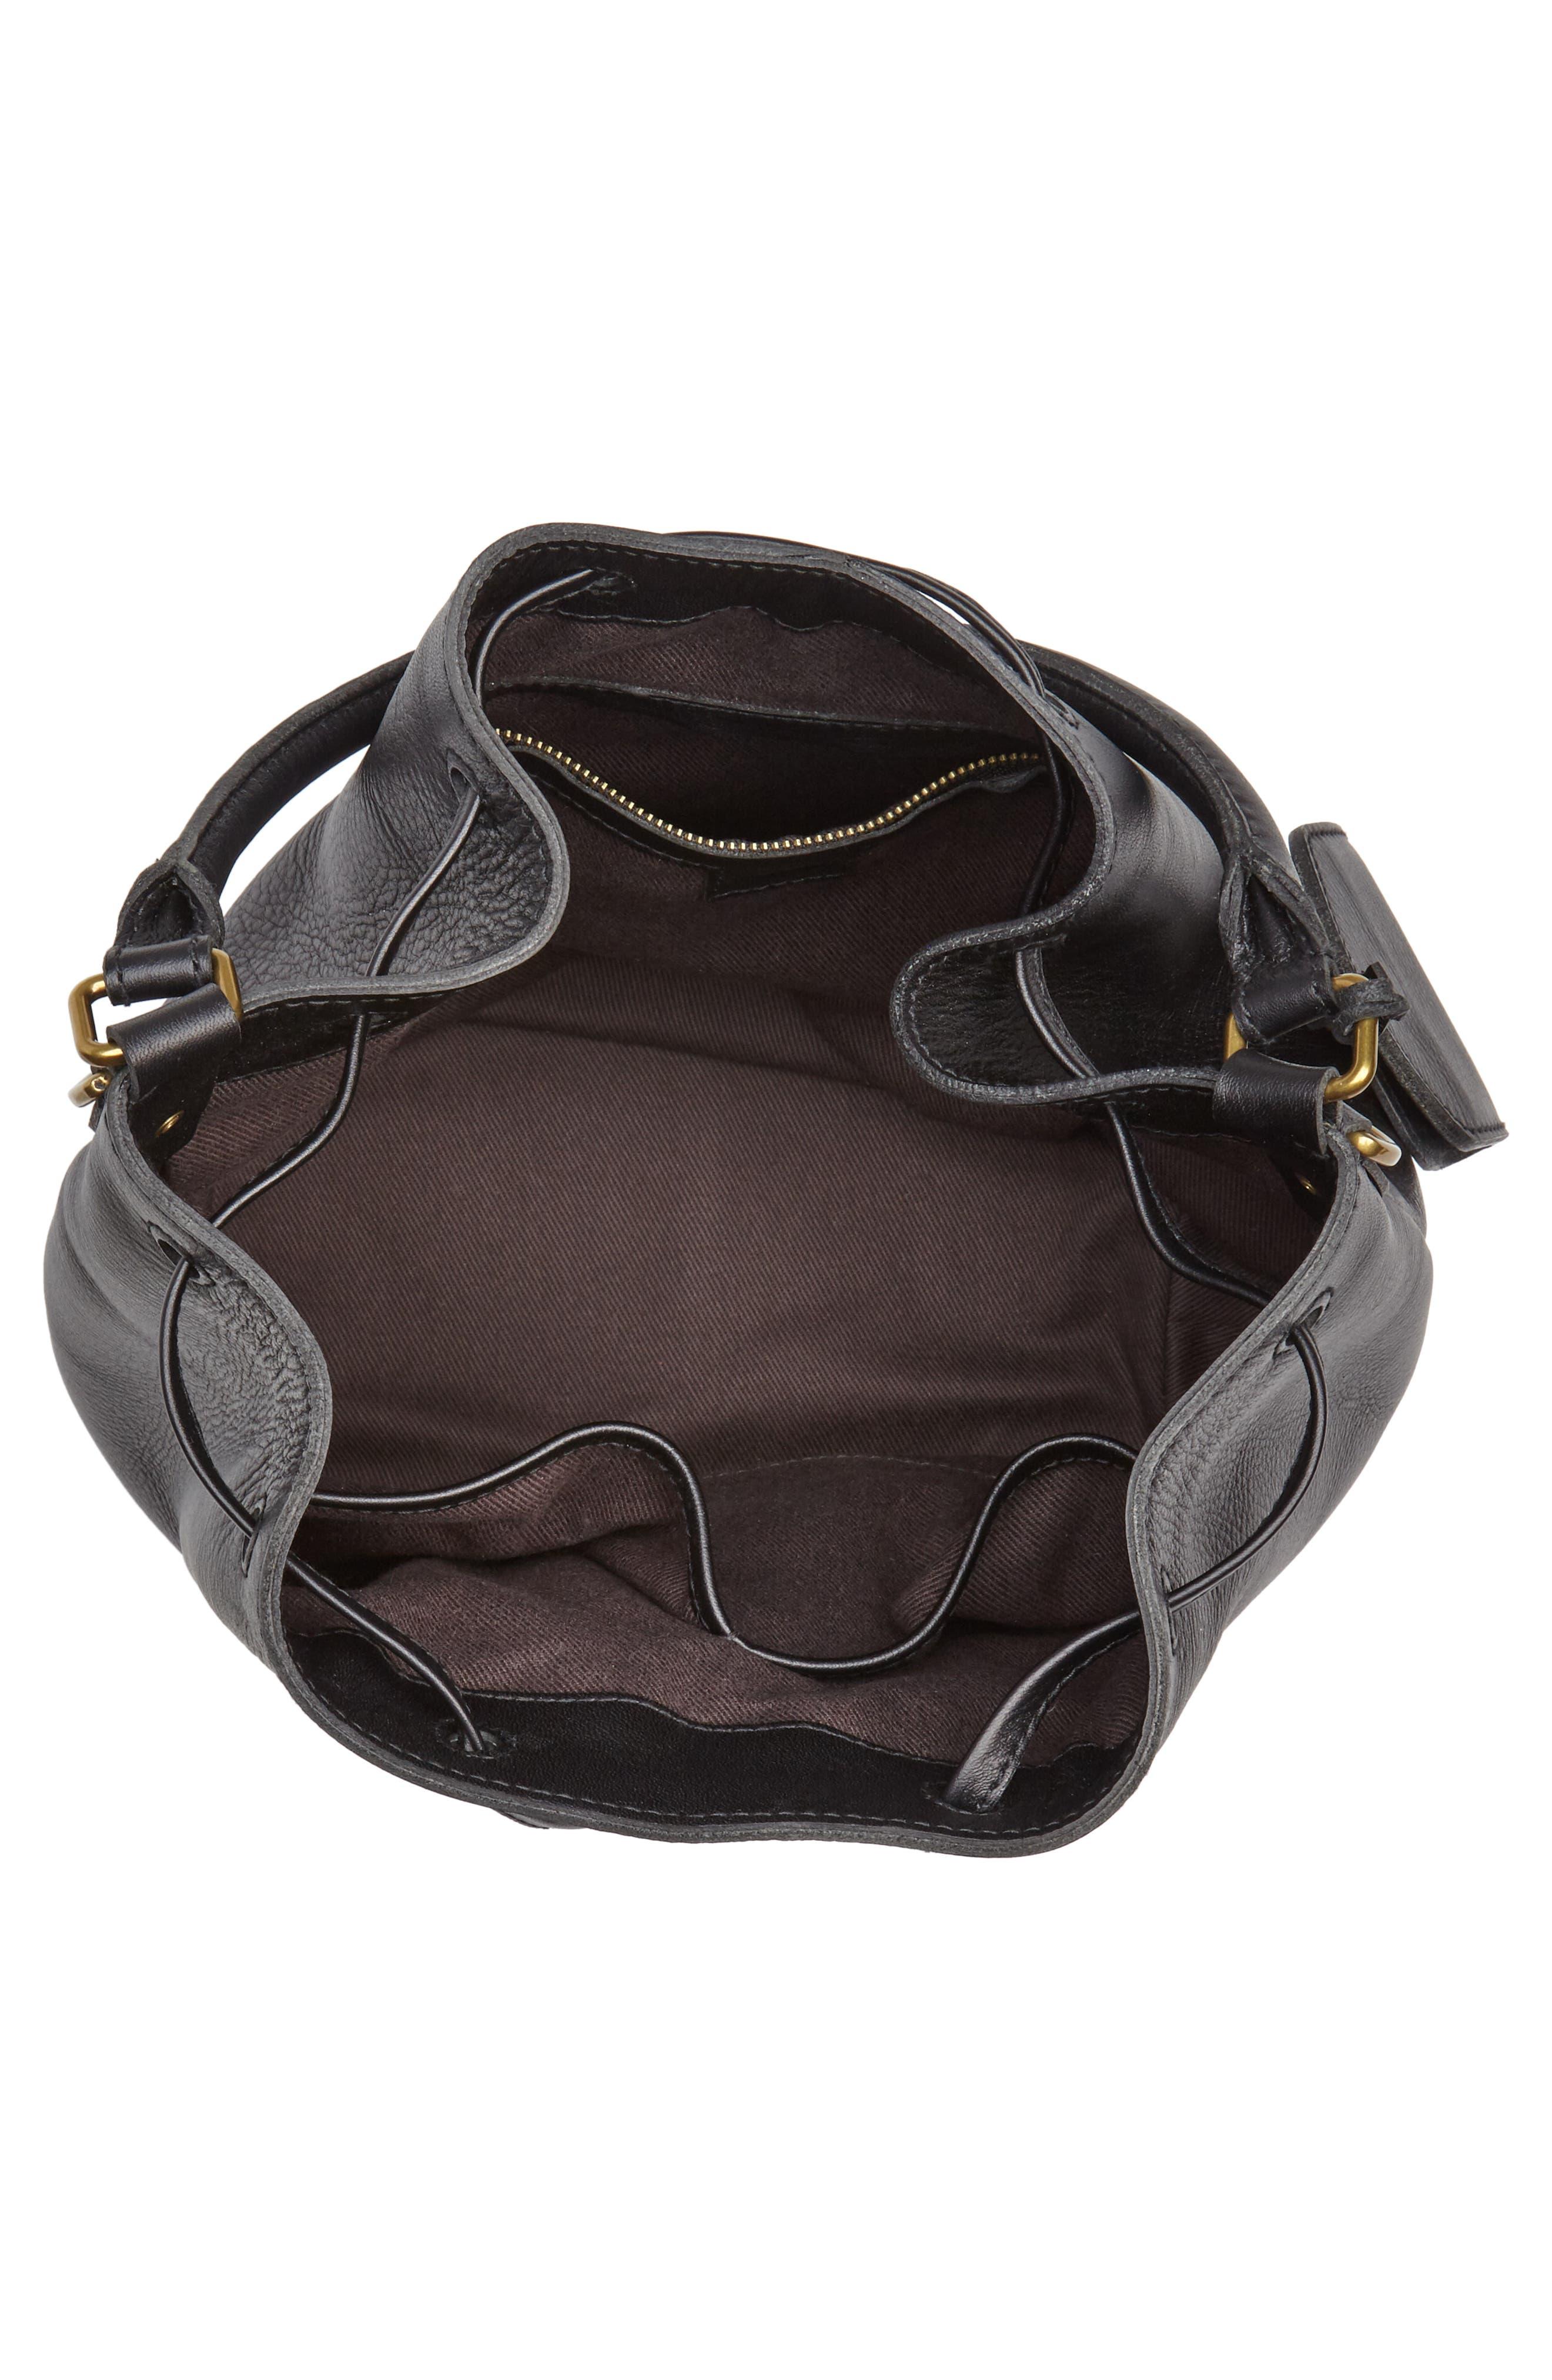 Lafayette Leather Bucket Bag,                             Alternate thumbnail 4, color,                             True Black